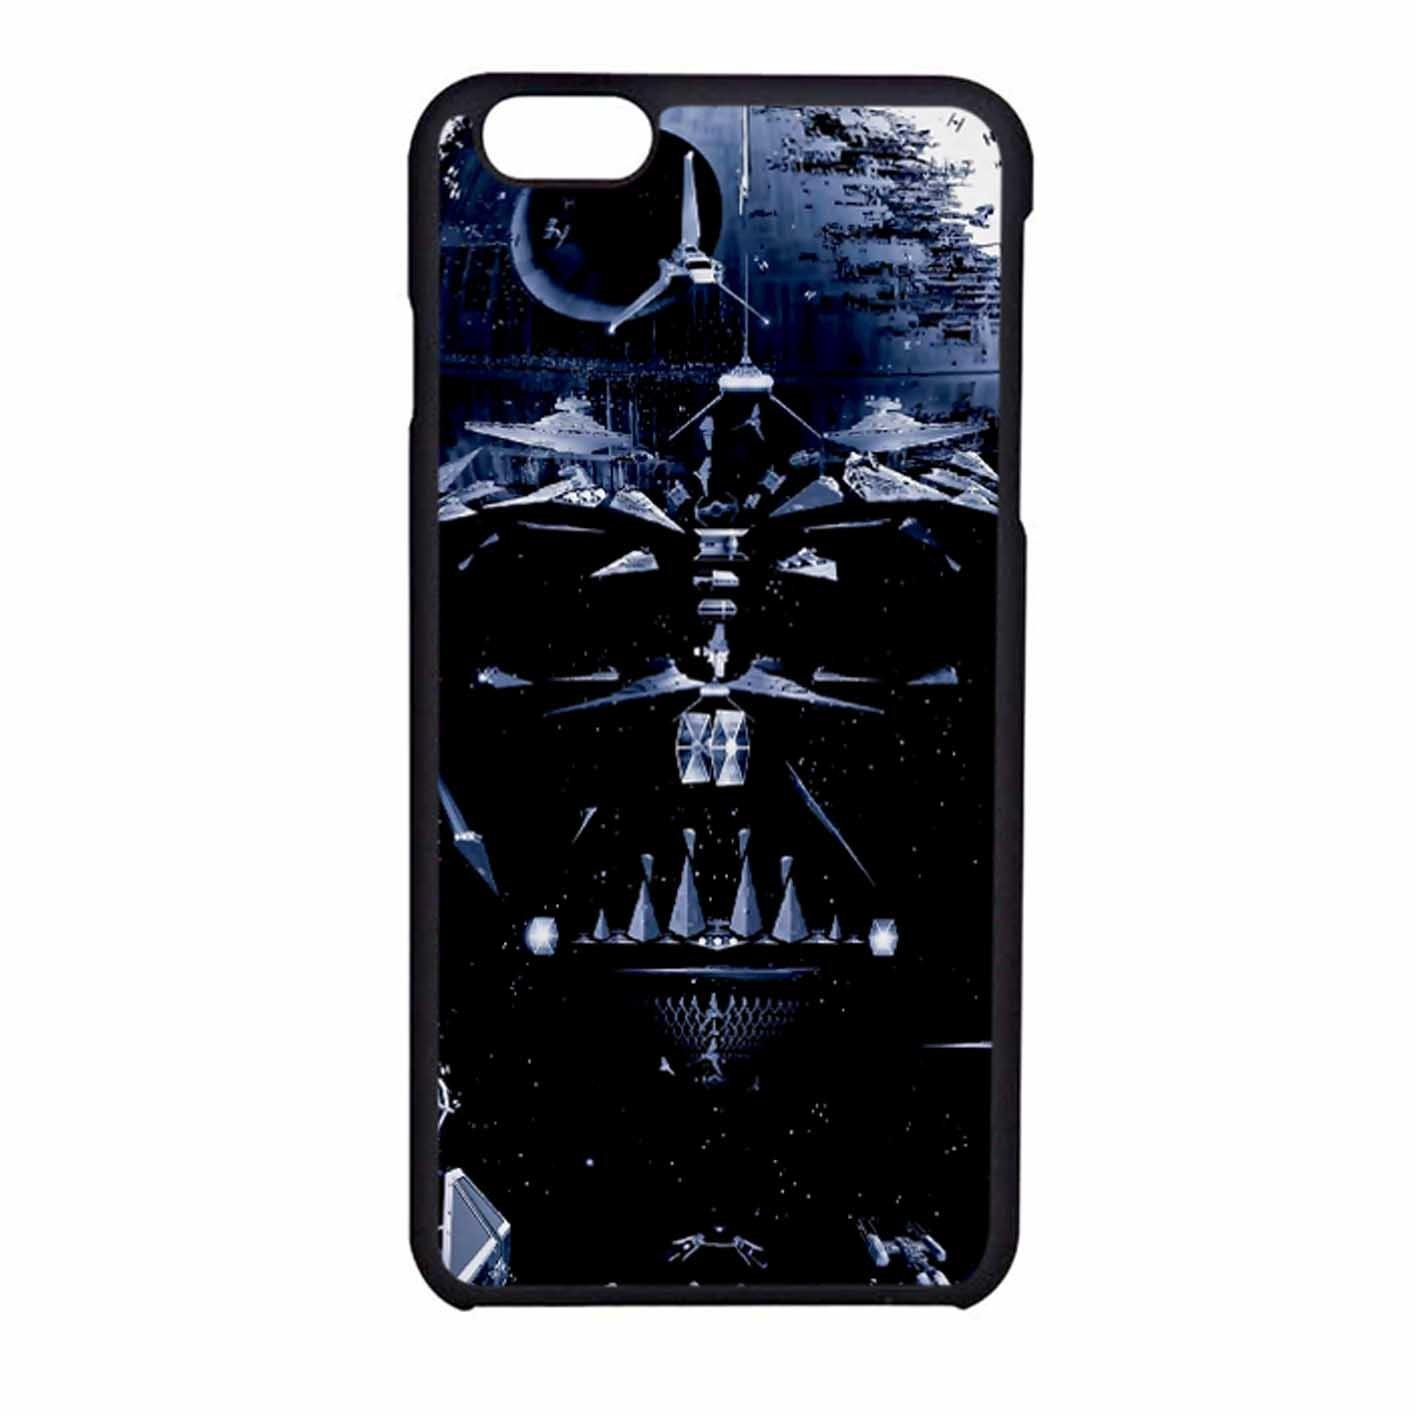 Darth Vader Wallpaper Iphone 6 6s Case Black Plastic Amazon Co Uk Electronics